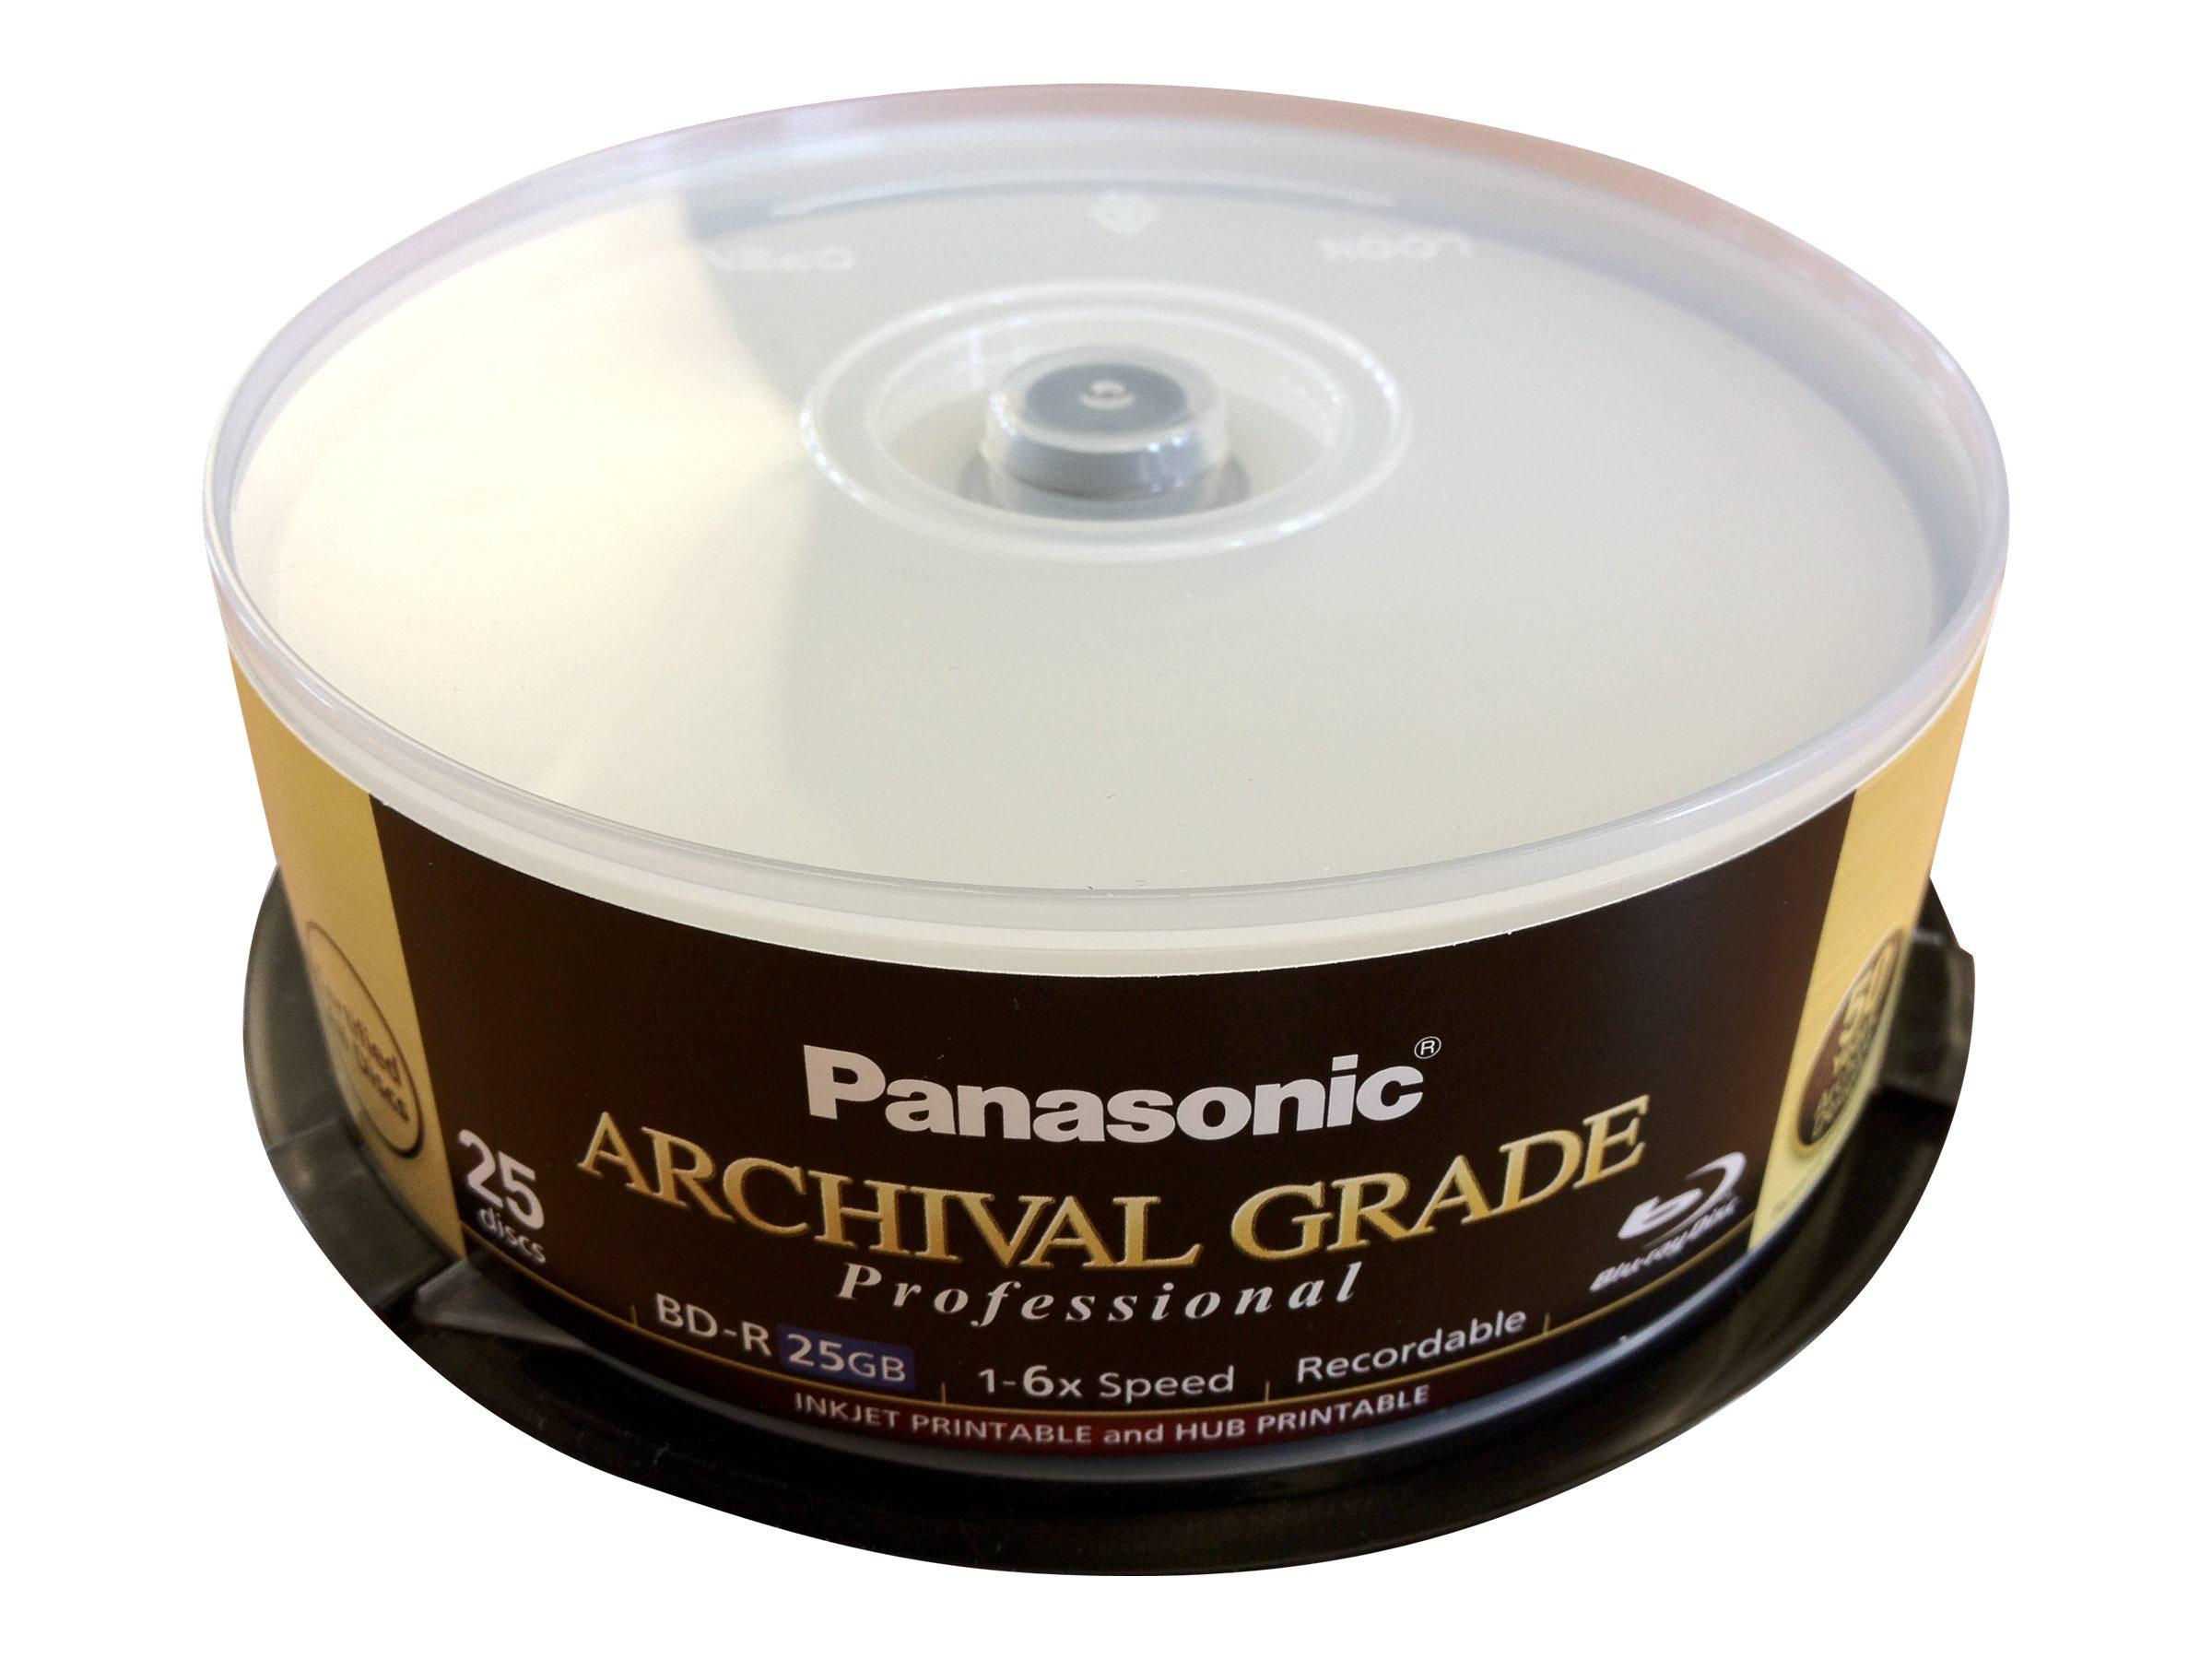 Panasonic ARCHIVAL GRADE Professional - 25 x BD-R - 25 GB 6x - mit Tintenstrahldrucker bedruckbare Oberfläche, Bedruckbarer Inne